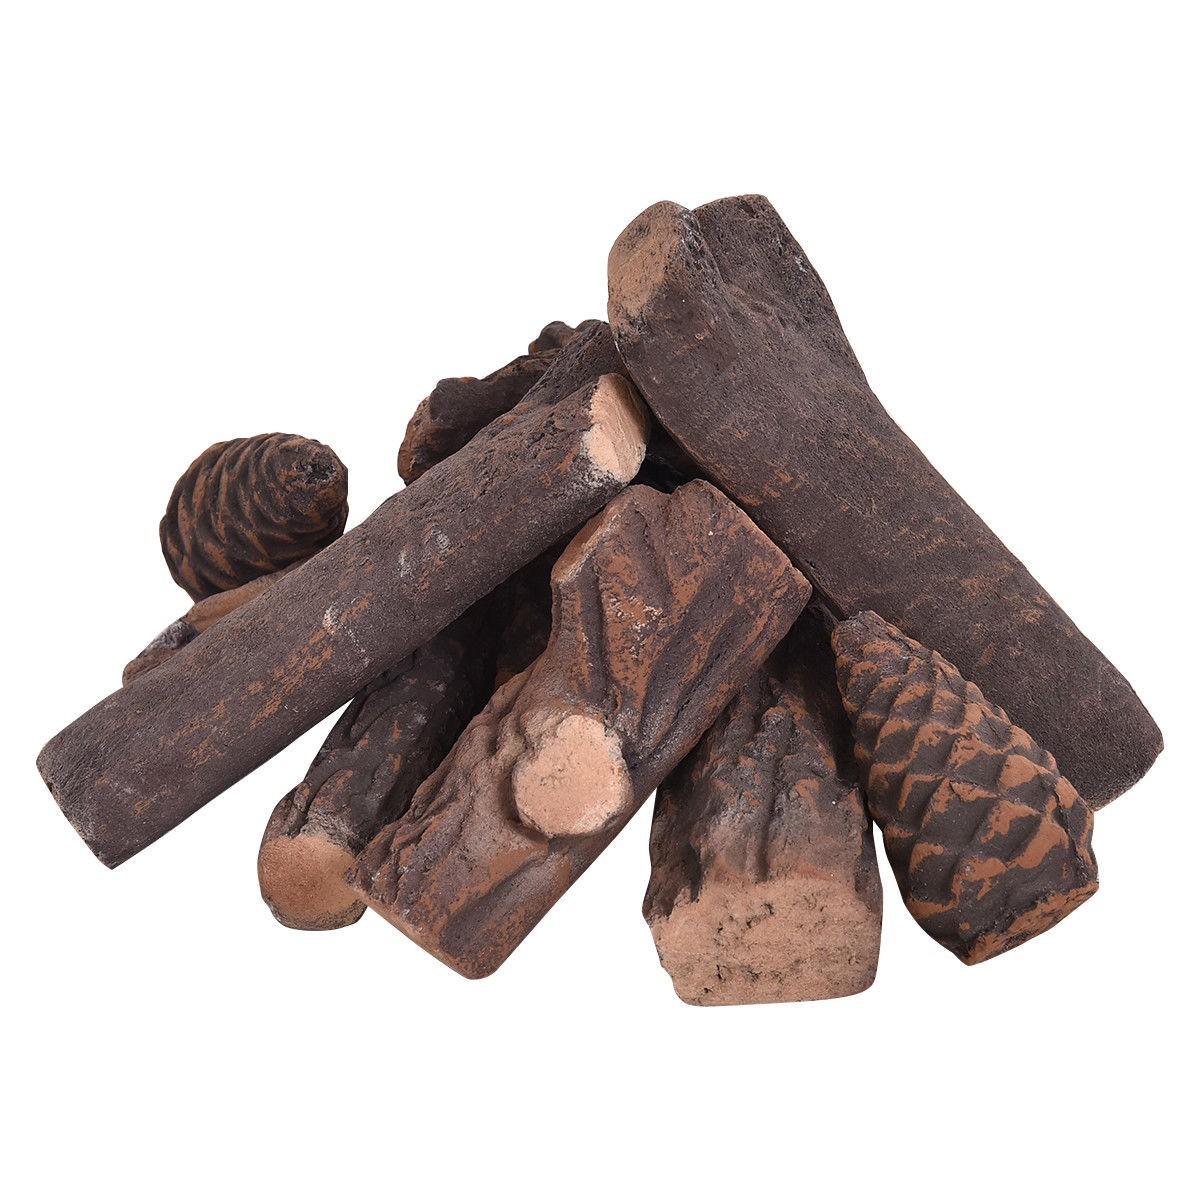 9 pcs Ceramic Fireplace Imitation Wood Propane Log Set